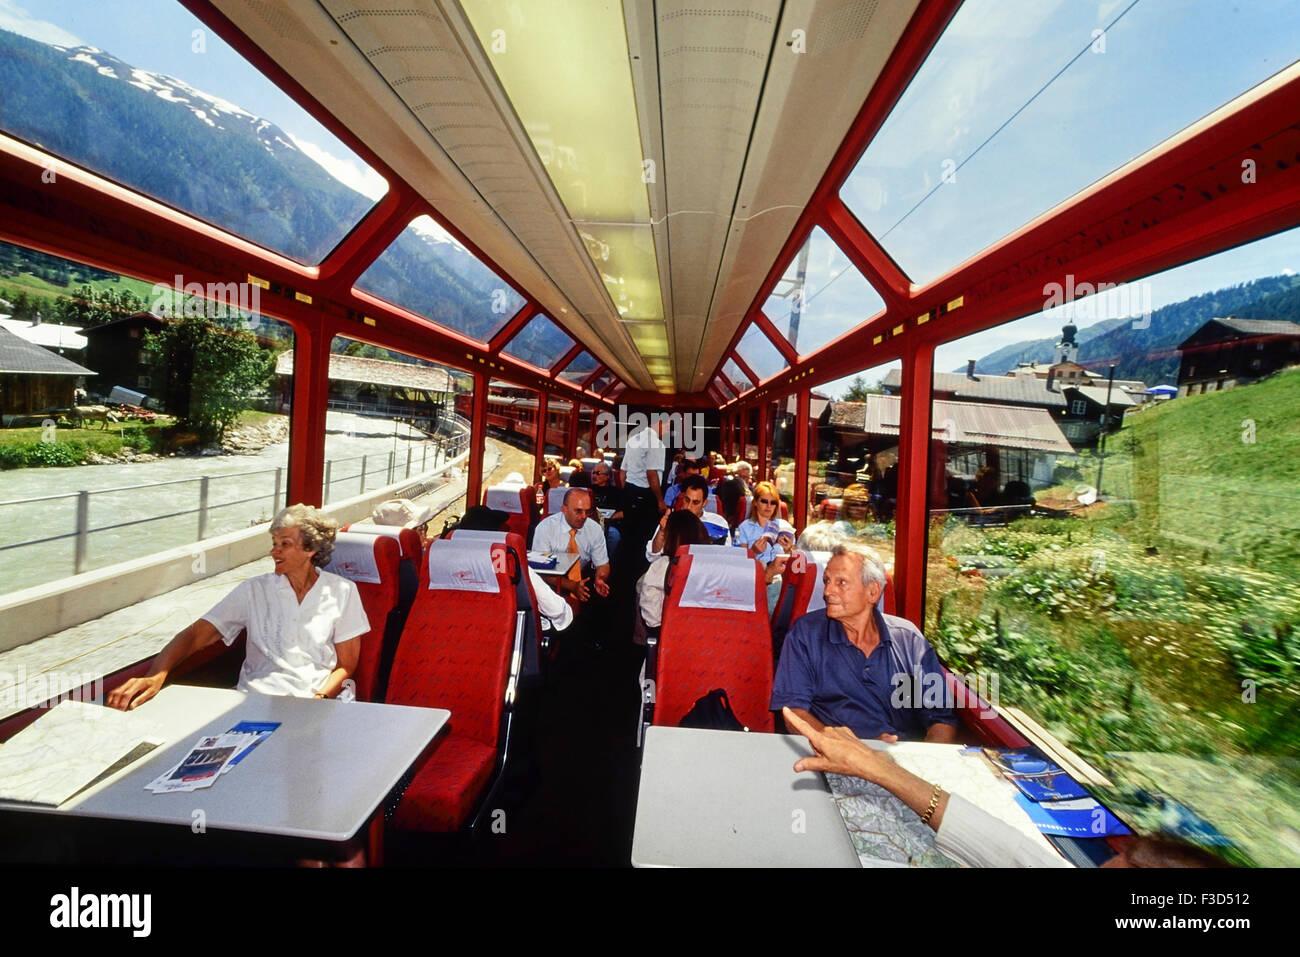 Passengers on board the Glacier Express. Switzerland. Europe - Stock Image